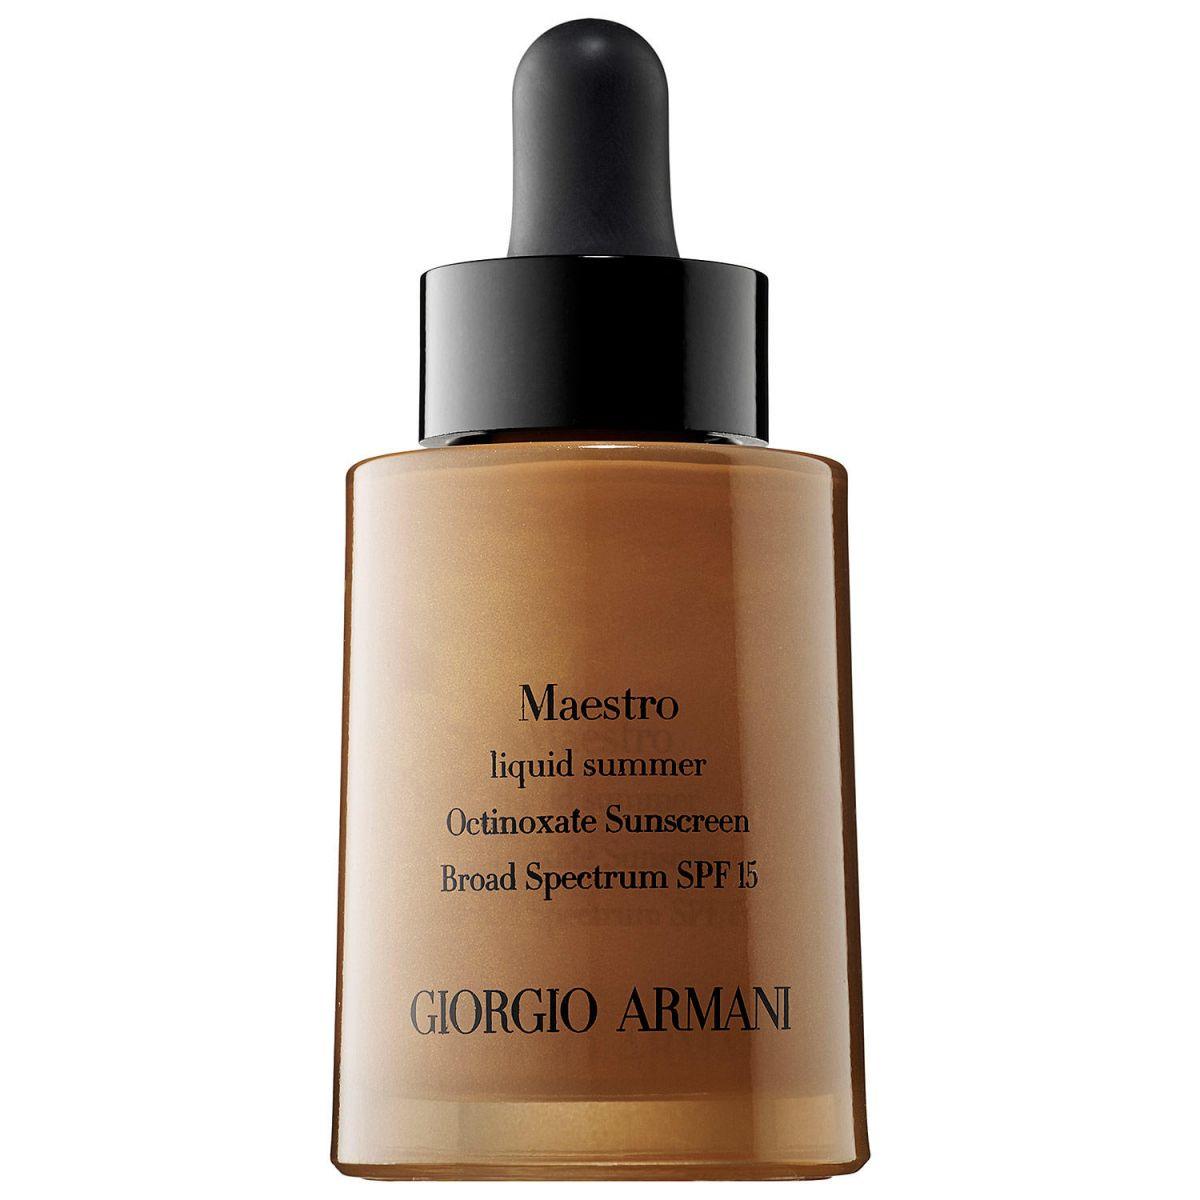 Georgio Armani Maestro Liquid Summer Get Ready Faster